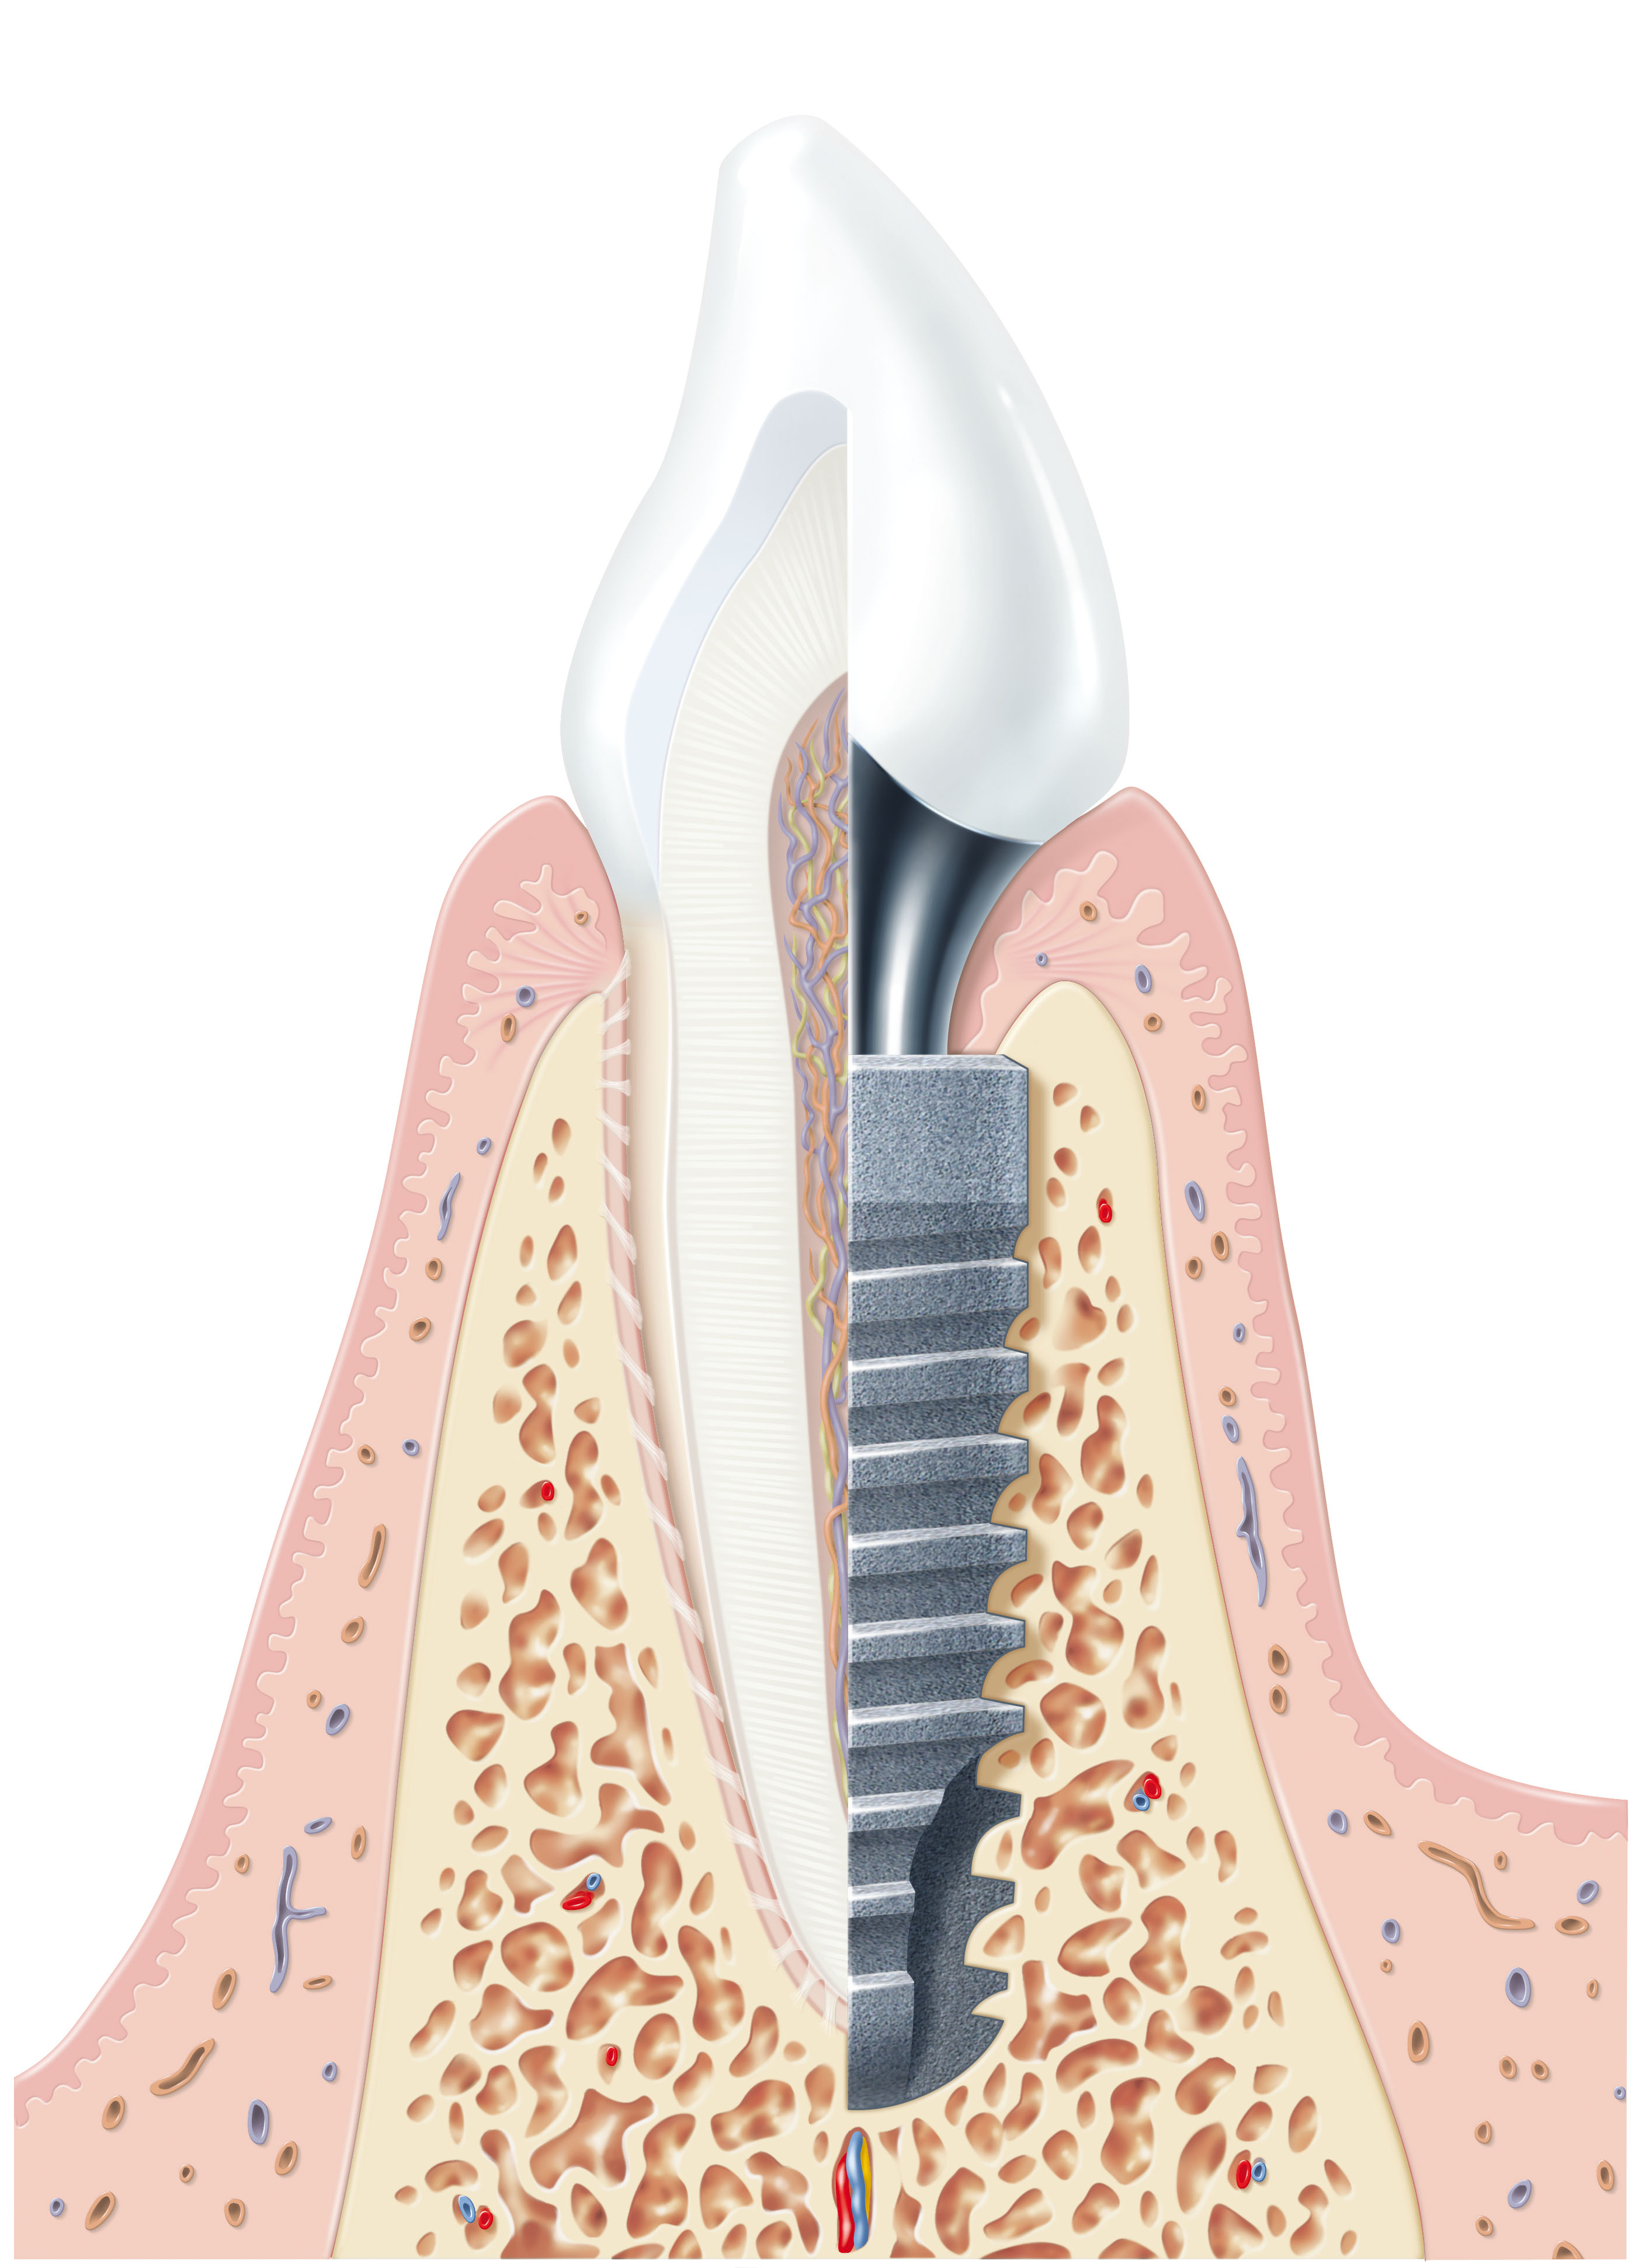 Oral implantology implant dentistry